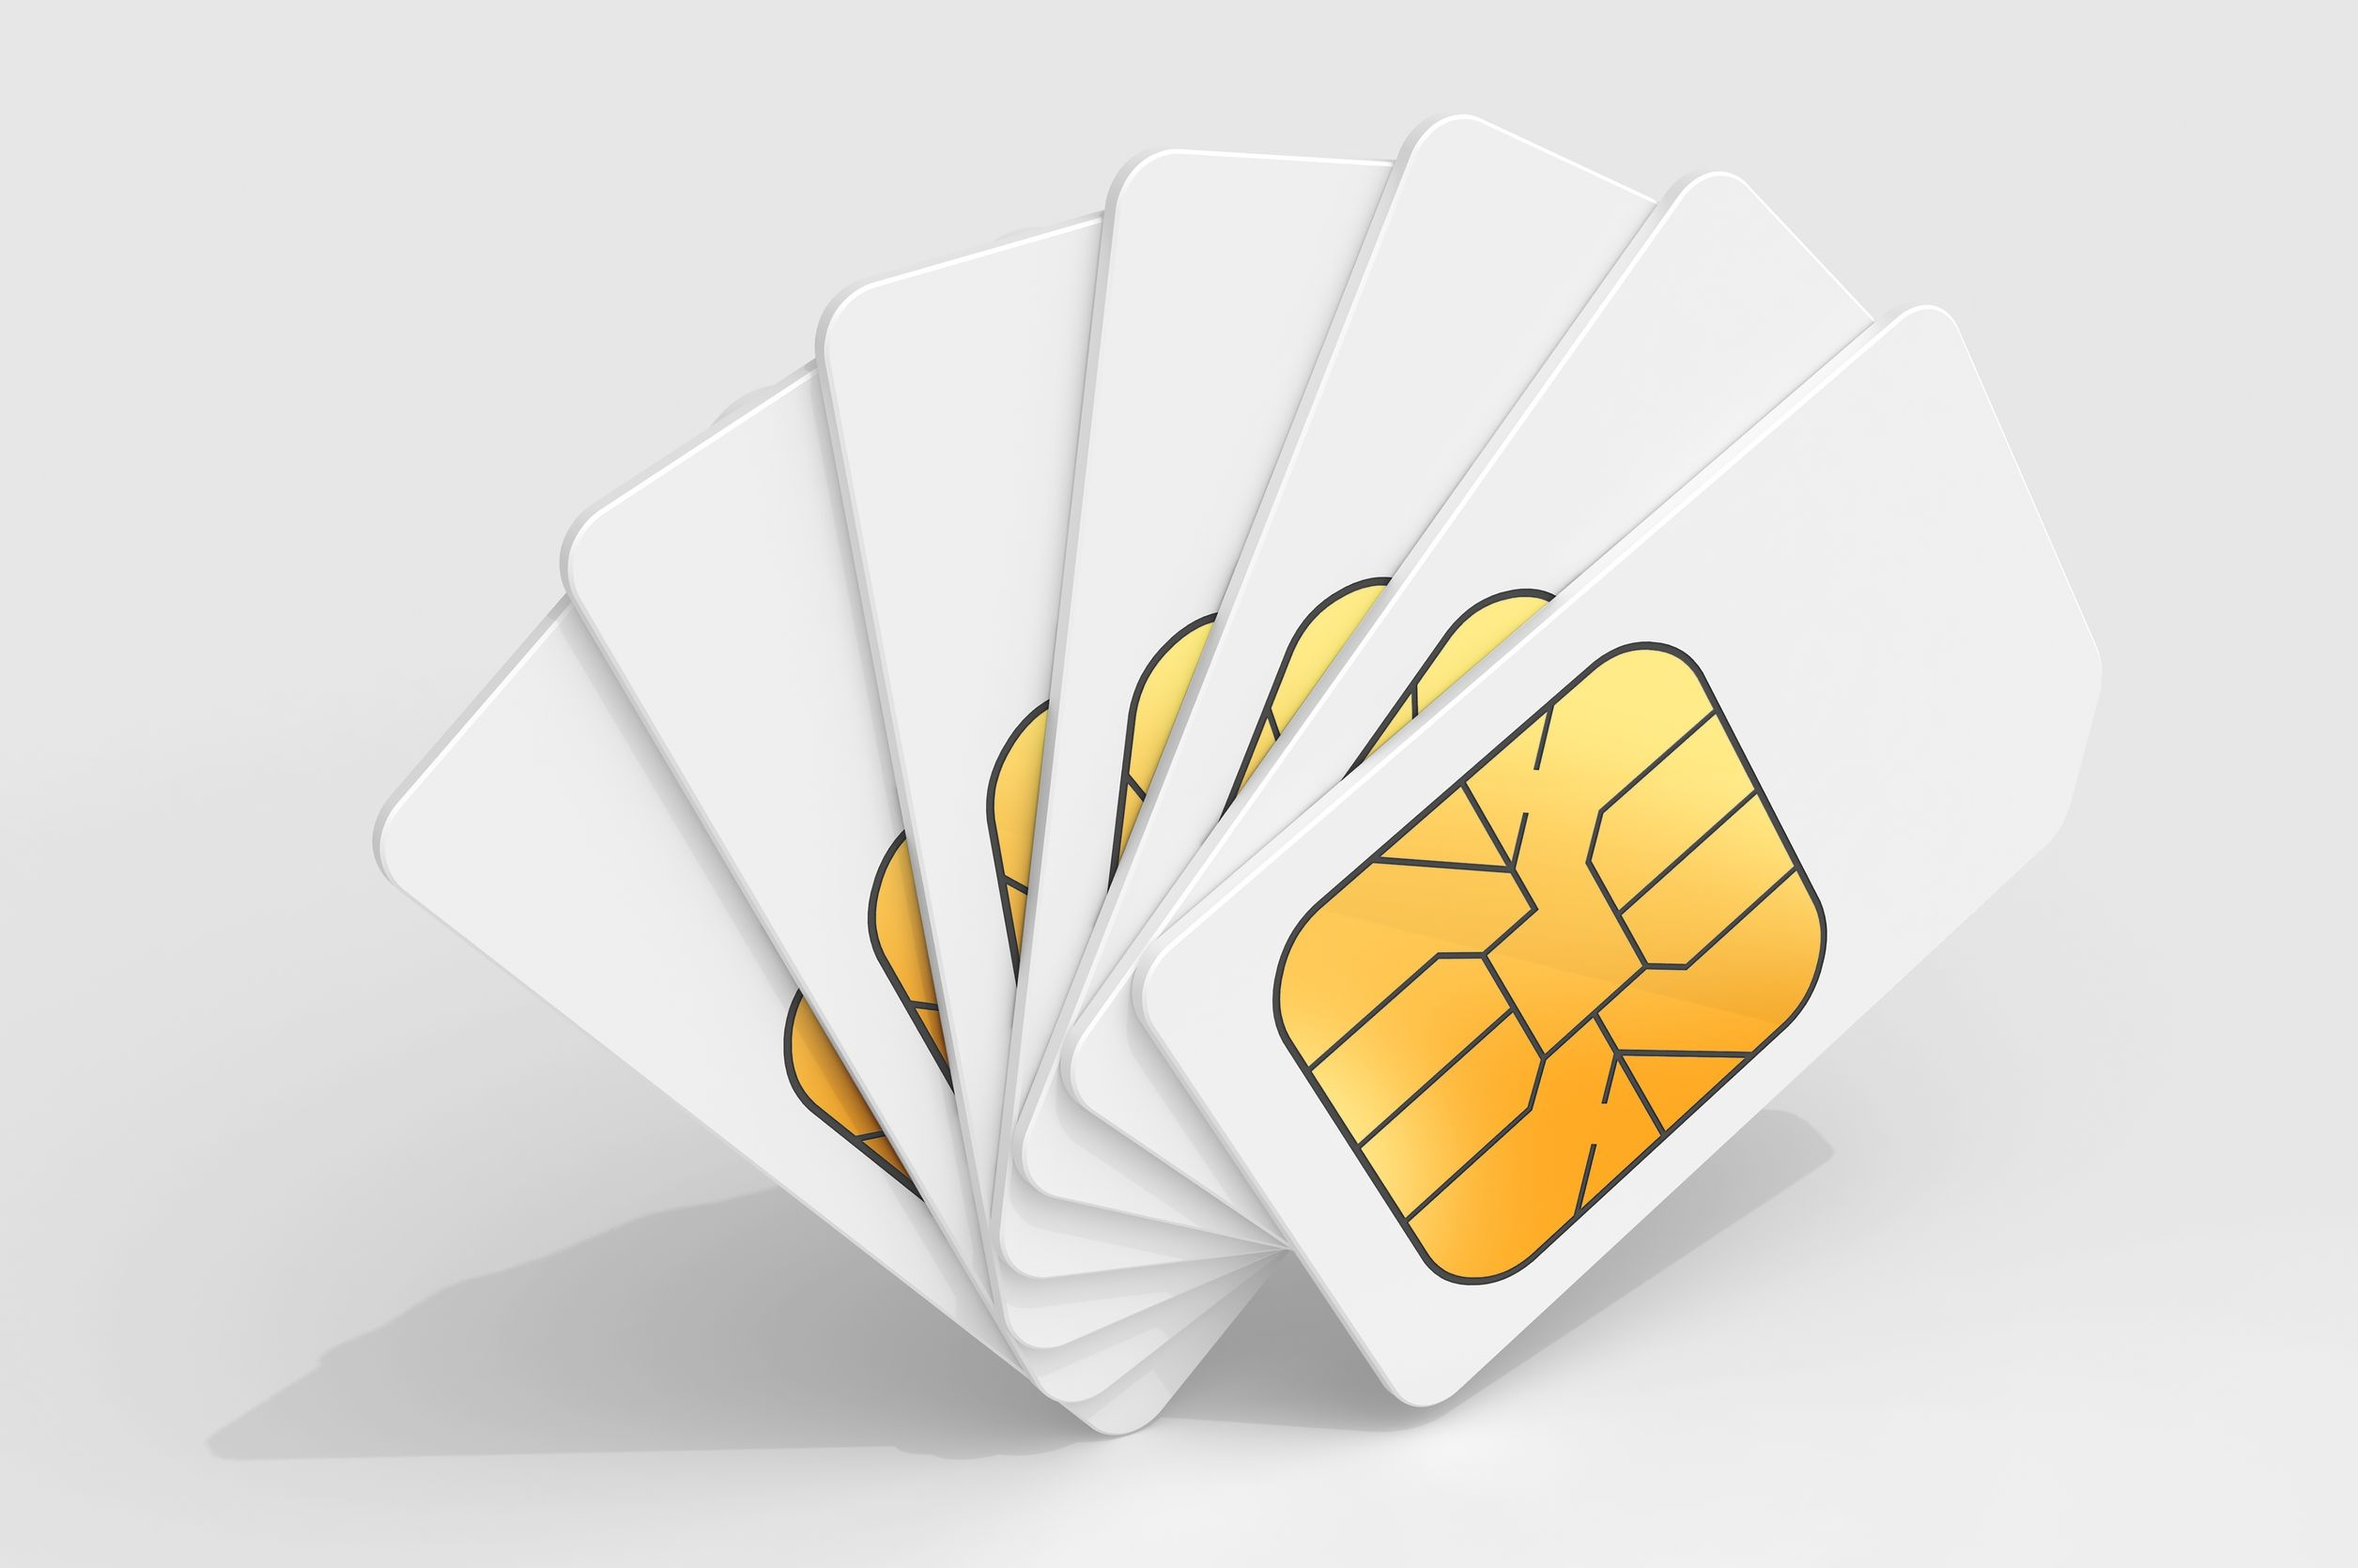 Sim cards - blank white